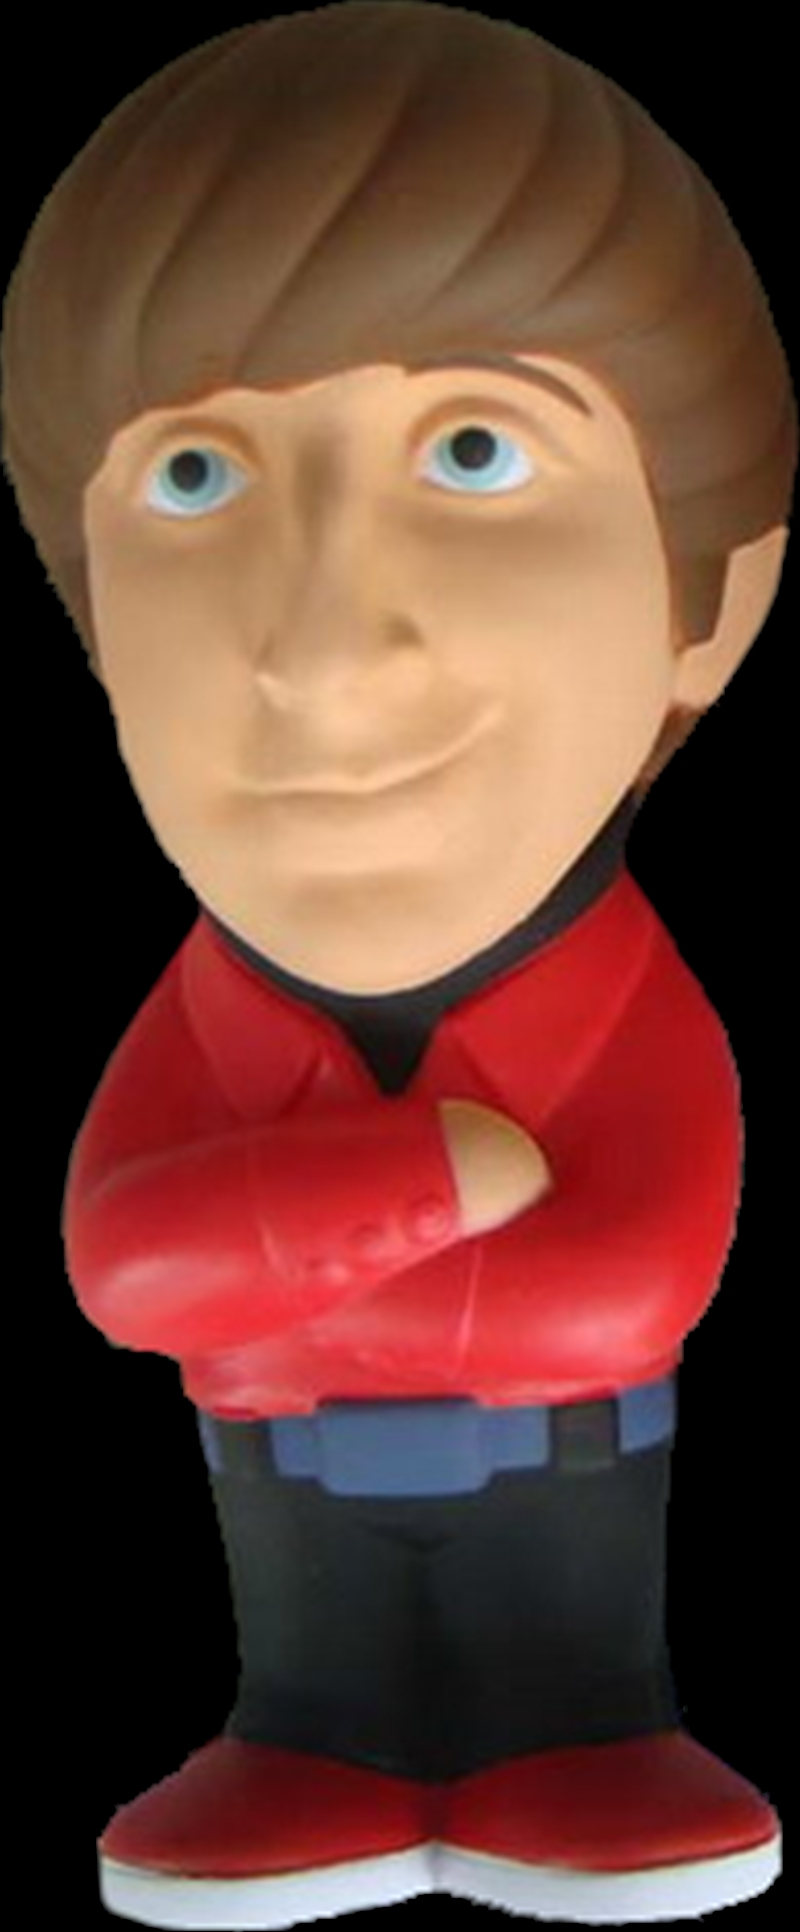 The Big Bang Theory - Howard Stress Doll | Merchandise